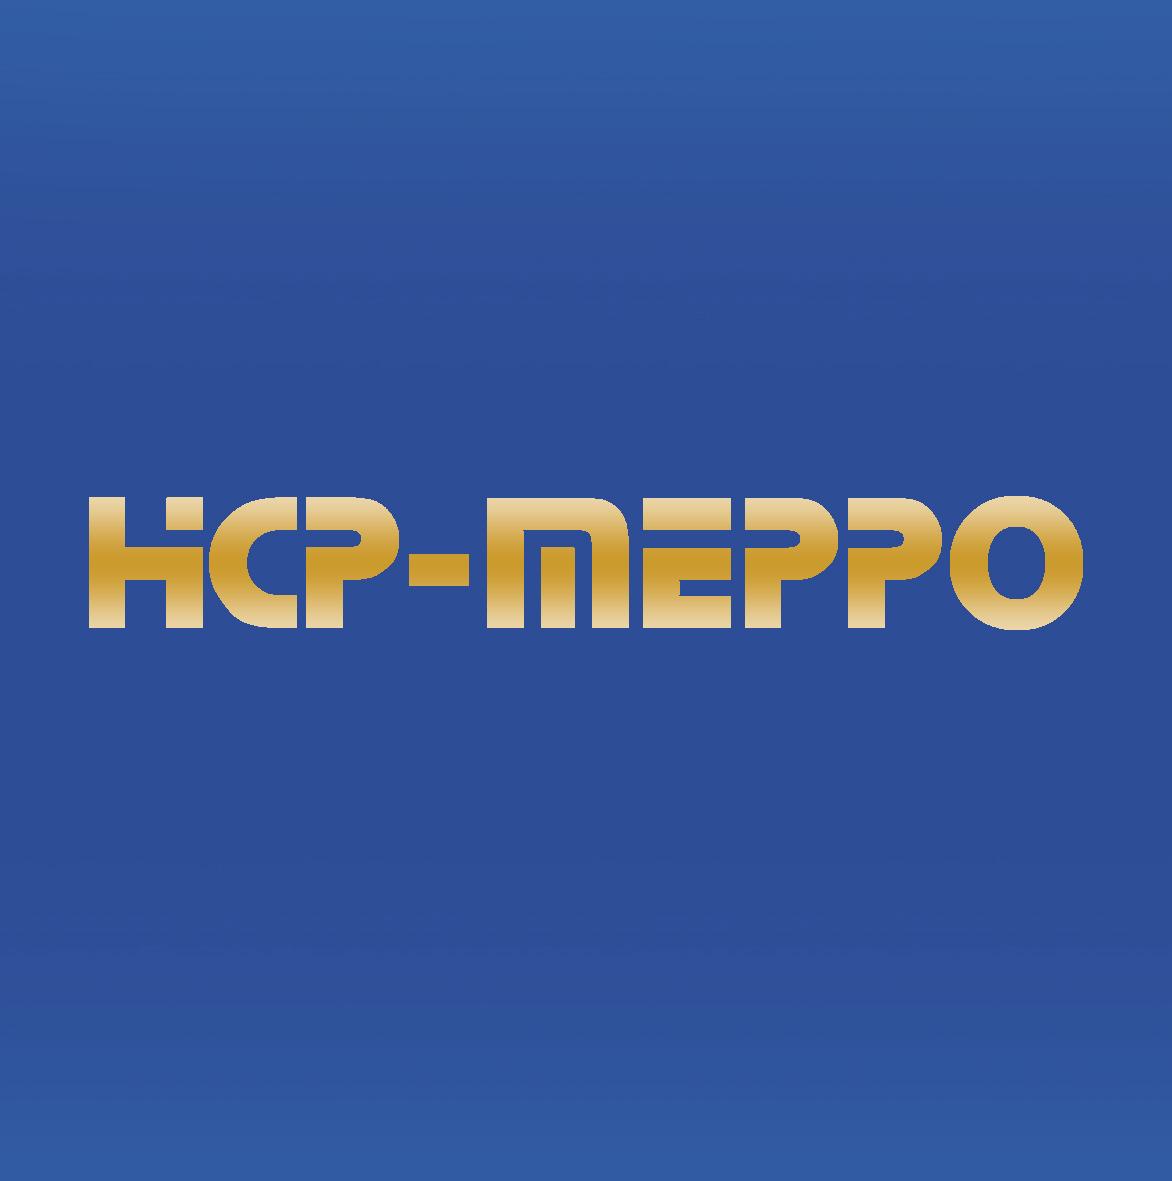 HCP-MEPPO logo Berytech3